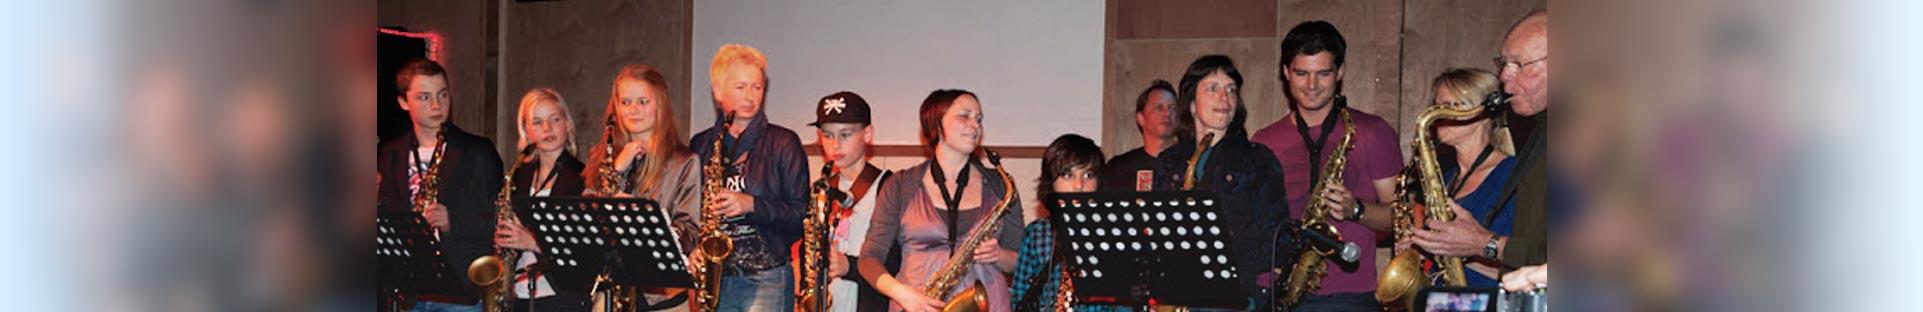 sessie samenspel muziekles groningen